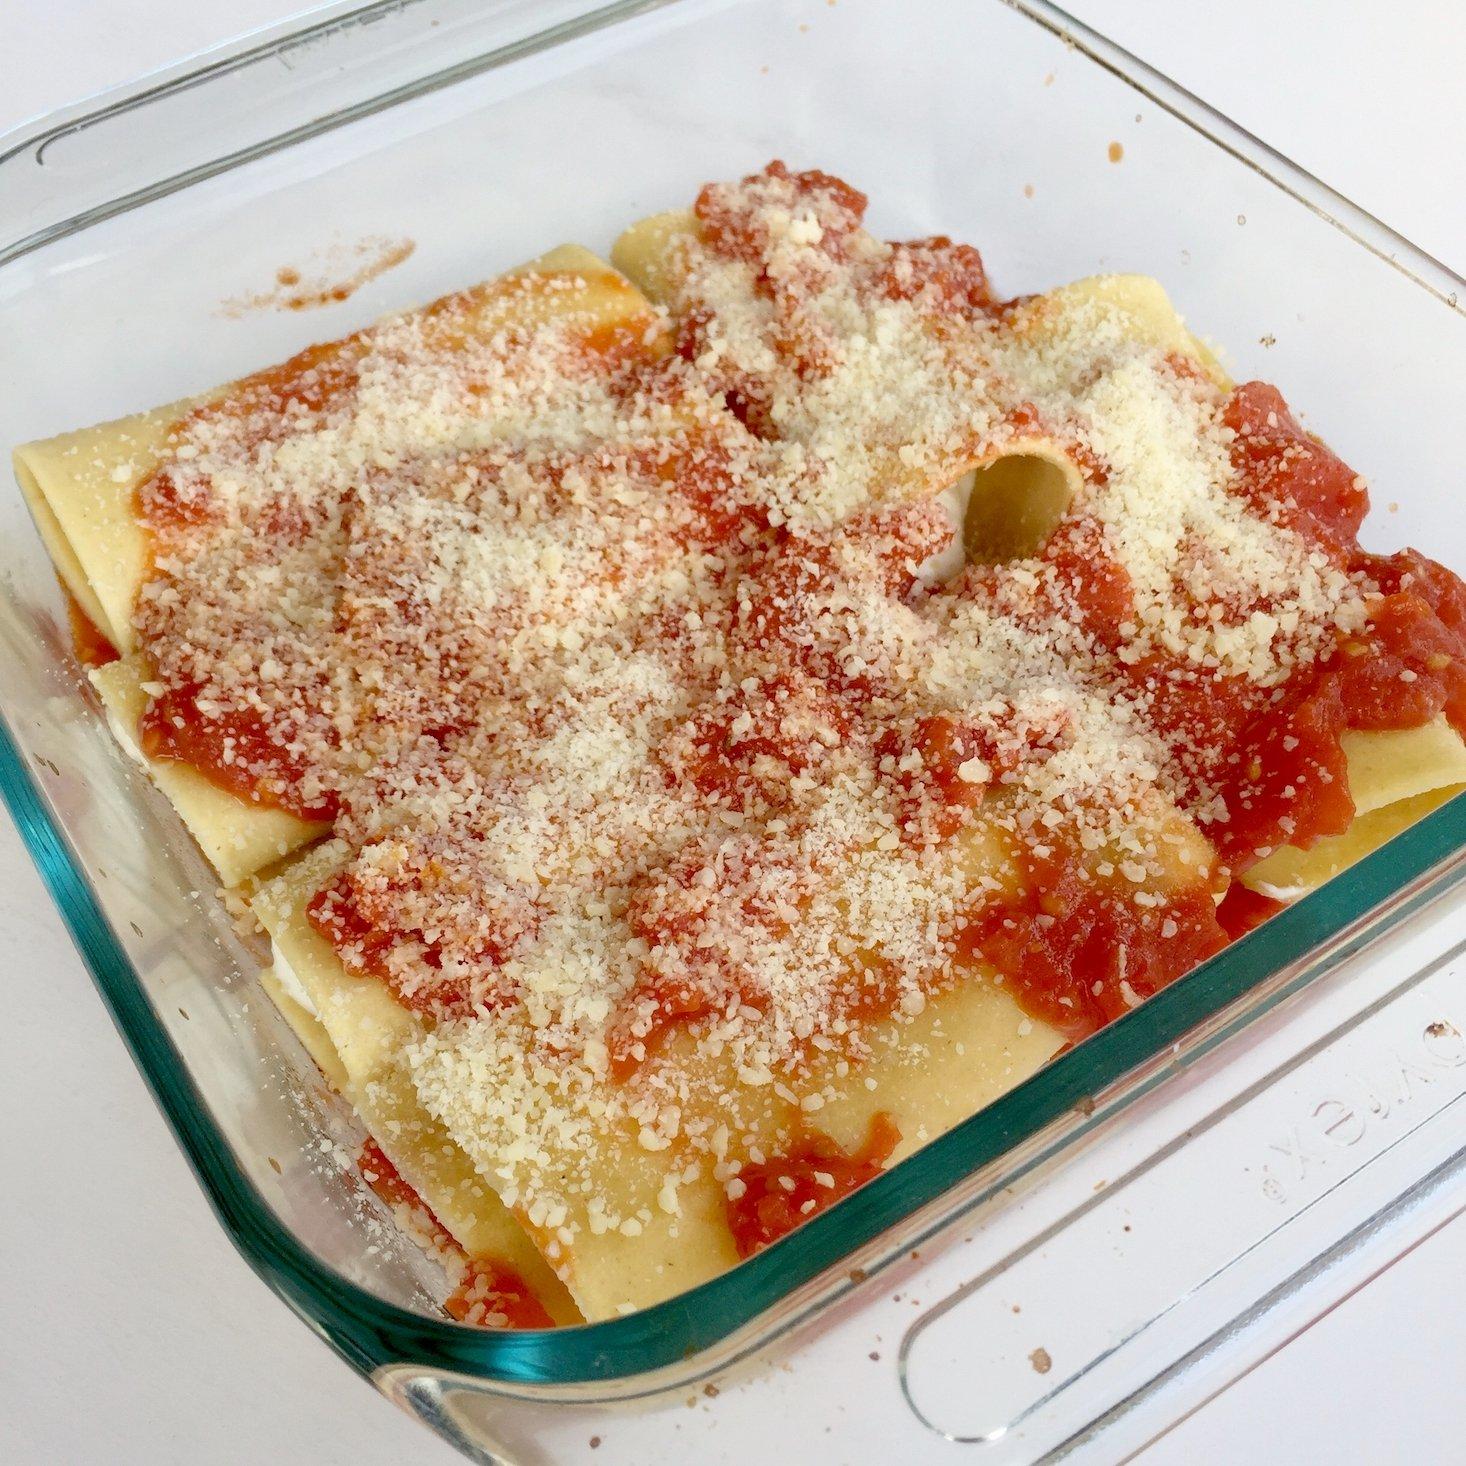 Blue-apron-february-2017-cannelloni-raw